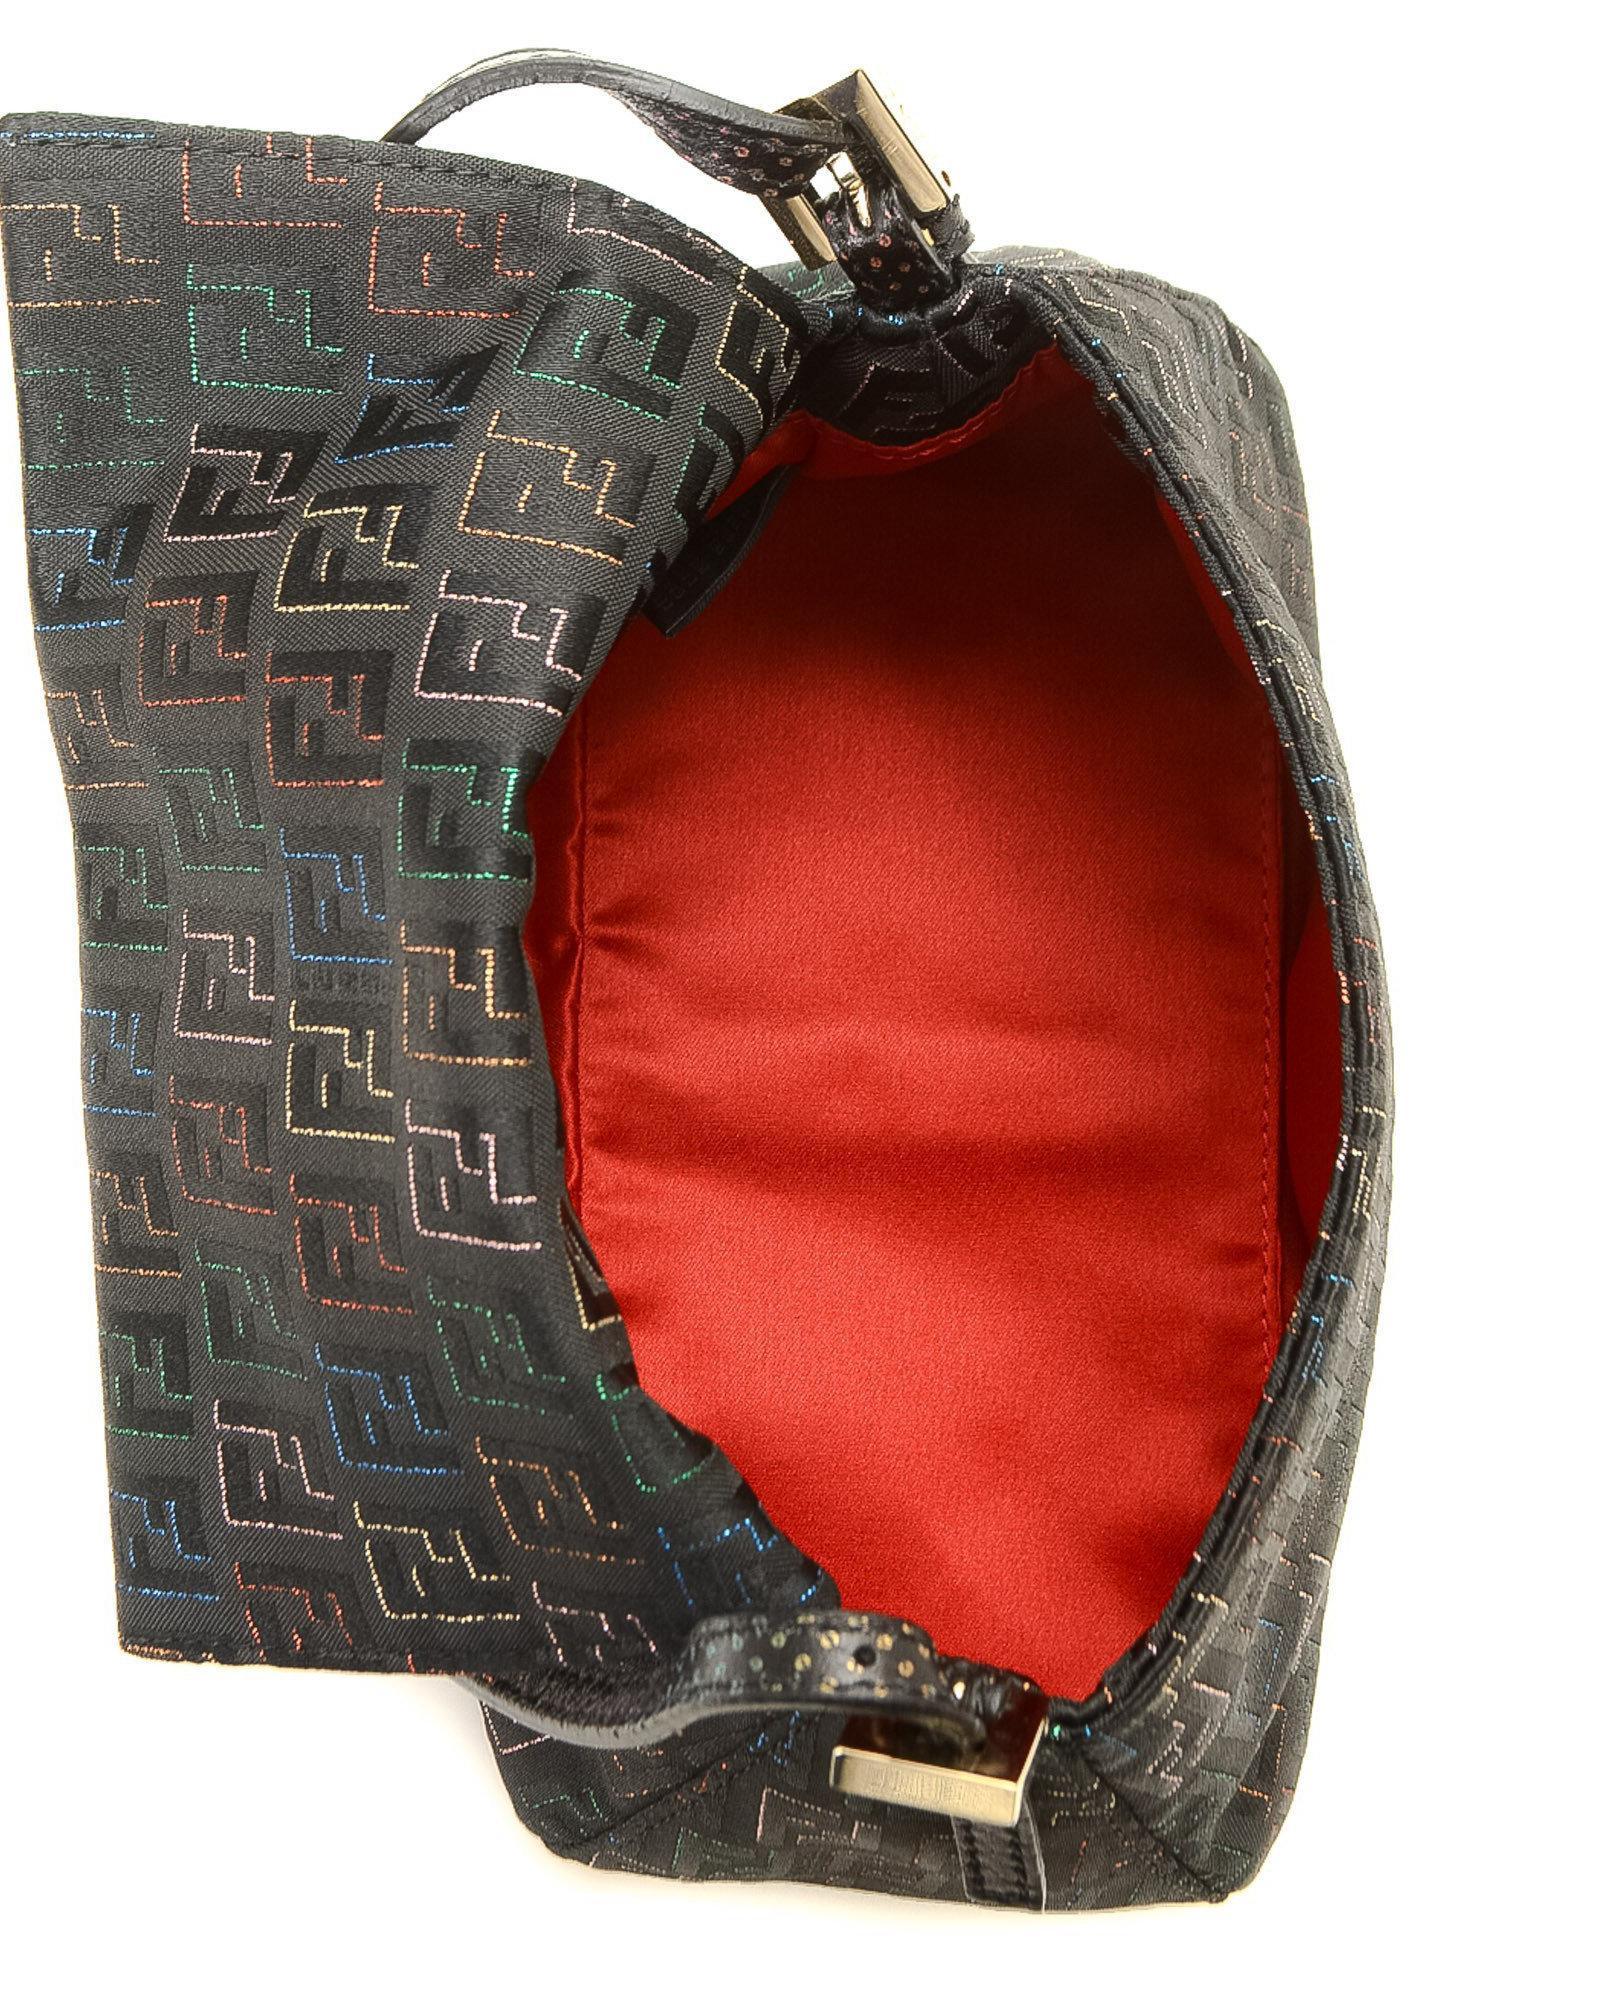 Lyst - Fendi Zucca Handbag - Vintage in Black a6df008c2d31a